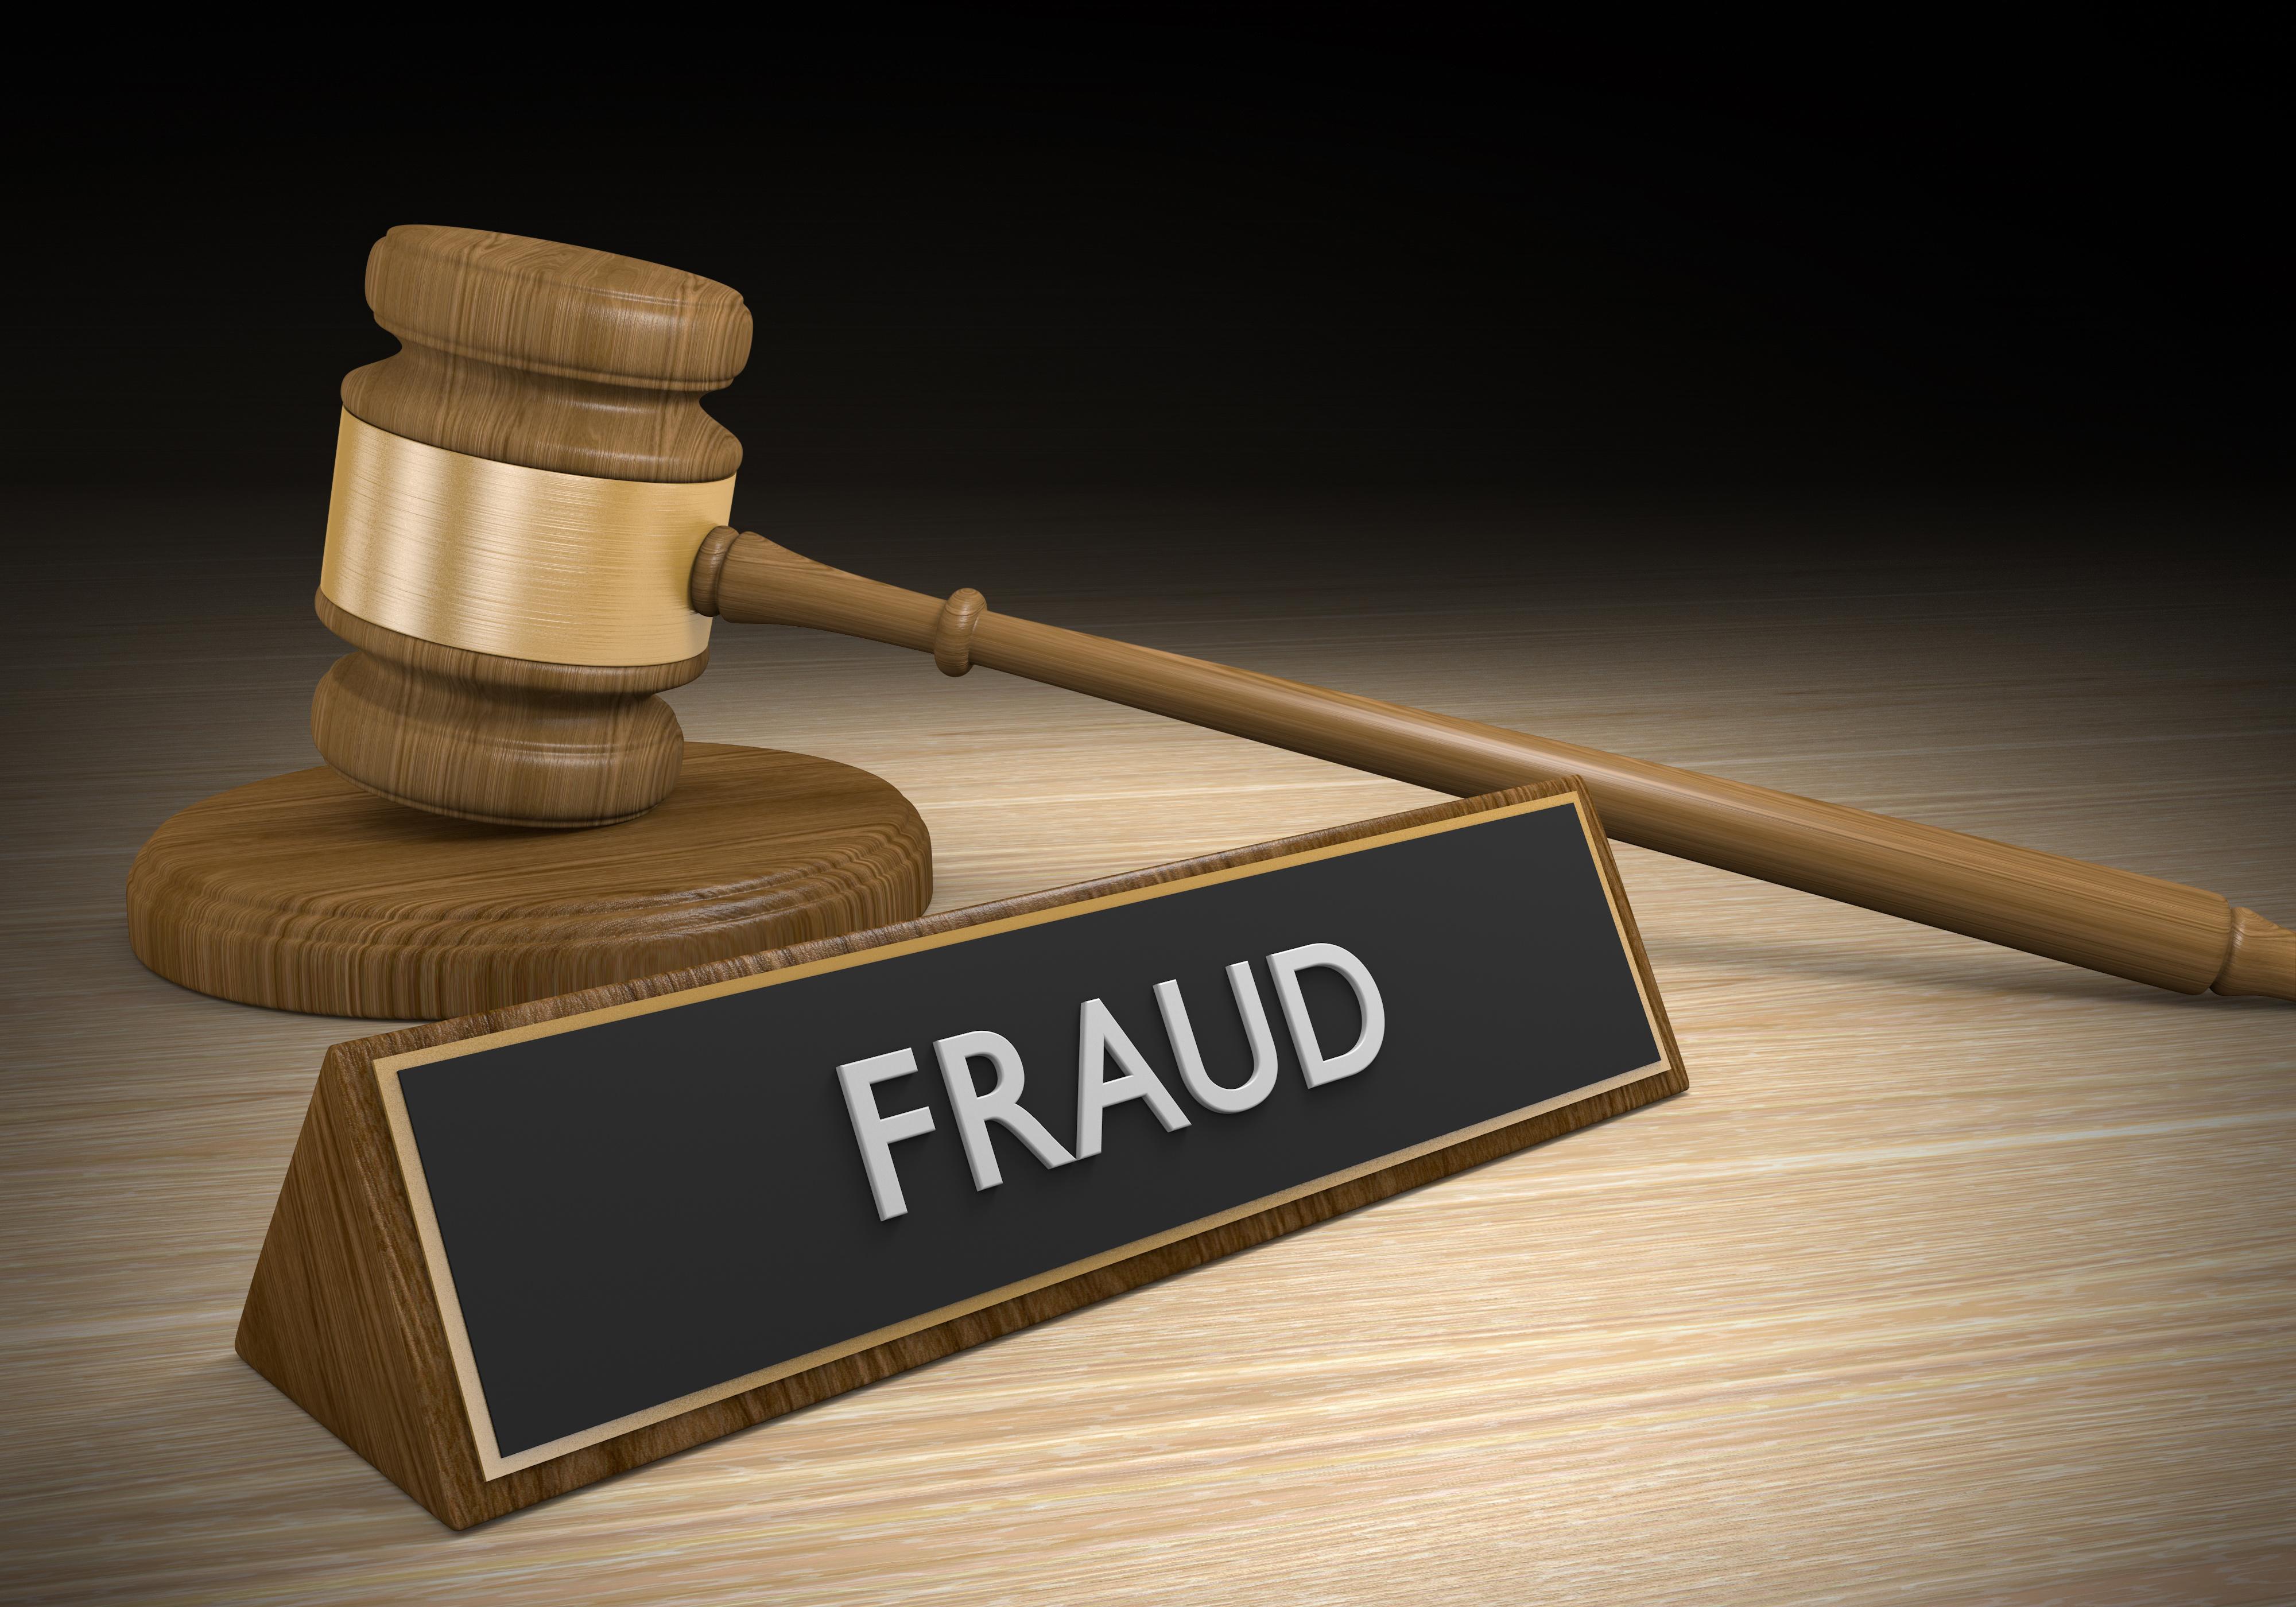 https://assets.sourcemedia.com/5c/19/7014752c4d6ab6a3377fb94368f4/fraud-adobe.jpg